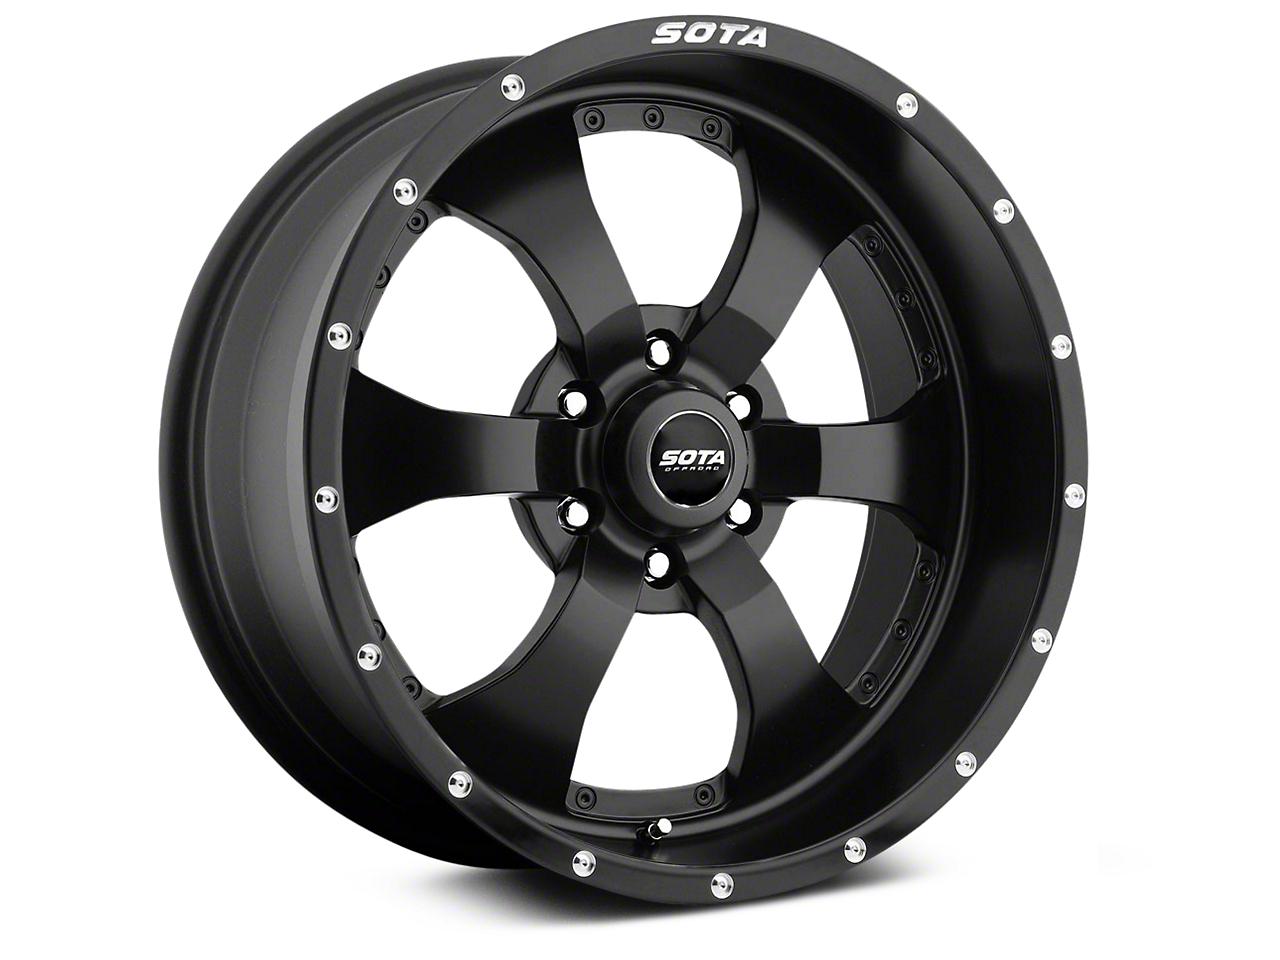 SOTA Off Road NOVAKANE Stealth Black 6-Lug Wheel - 20x9 (07-18 Sierra 1500)